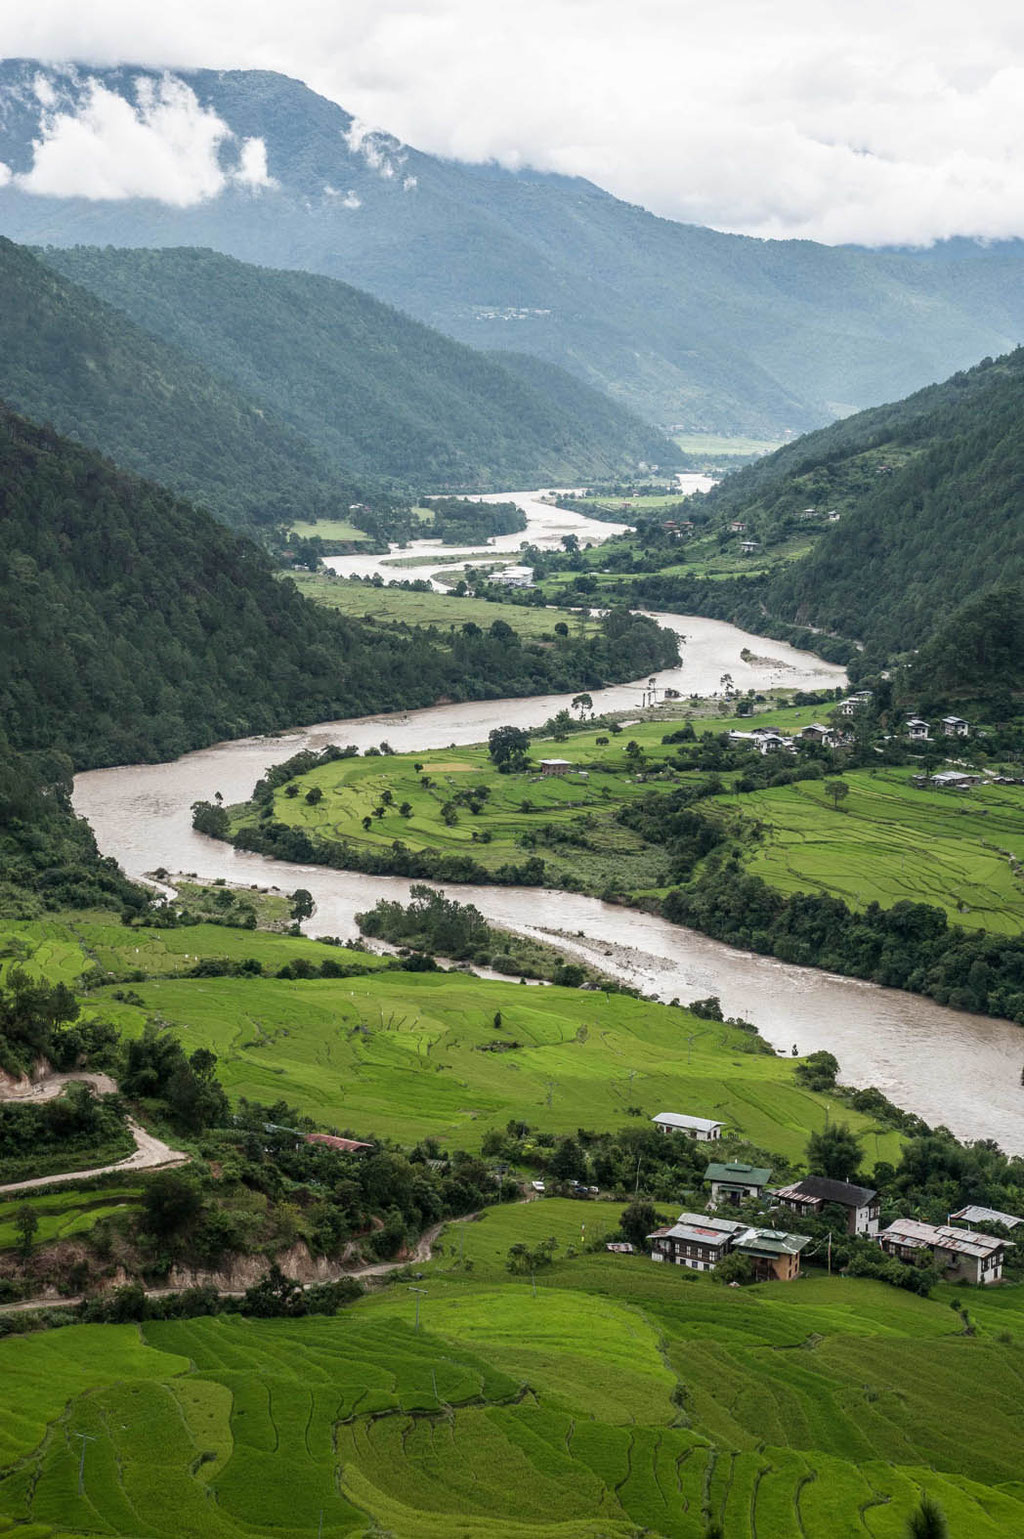 Wanderung/hike zum/to Khamsum Yulley Namgyal Chorten, Bhutan